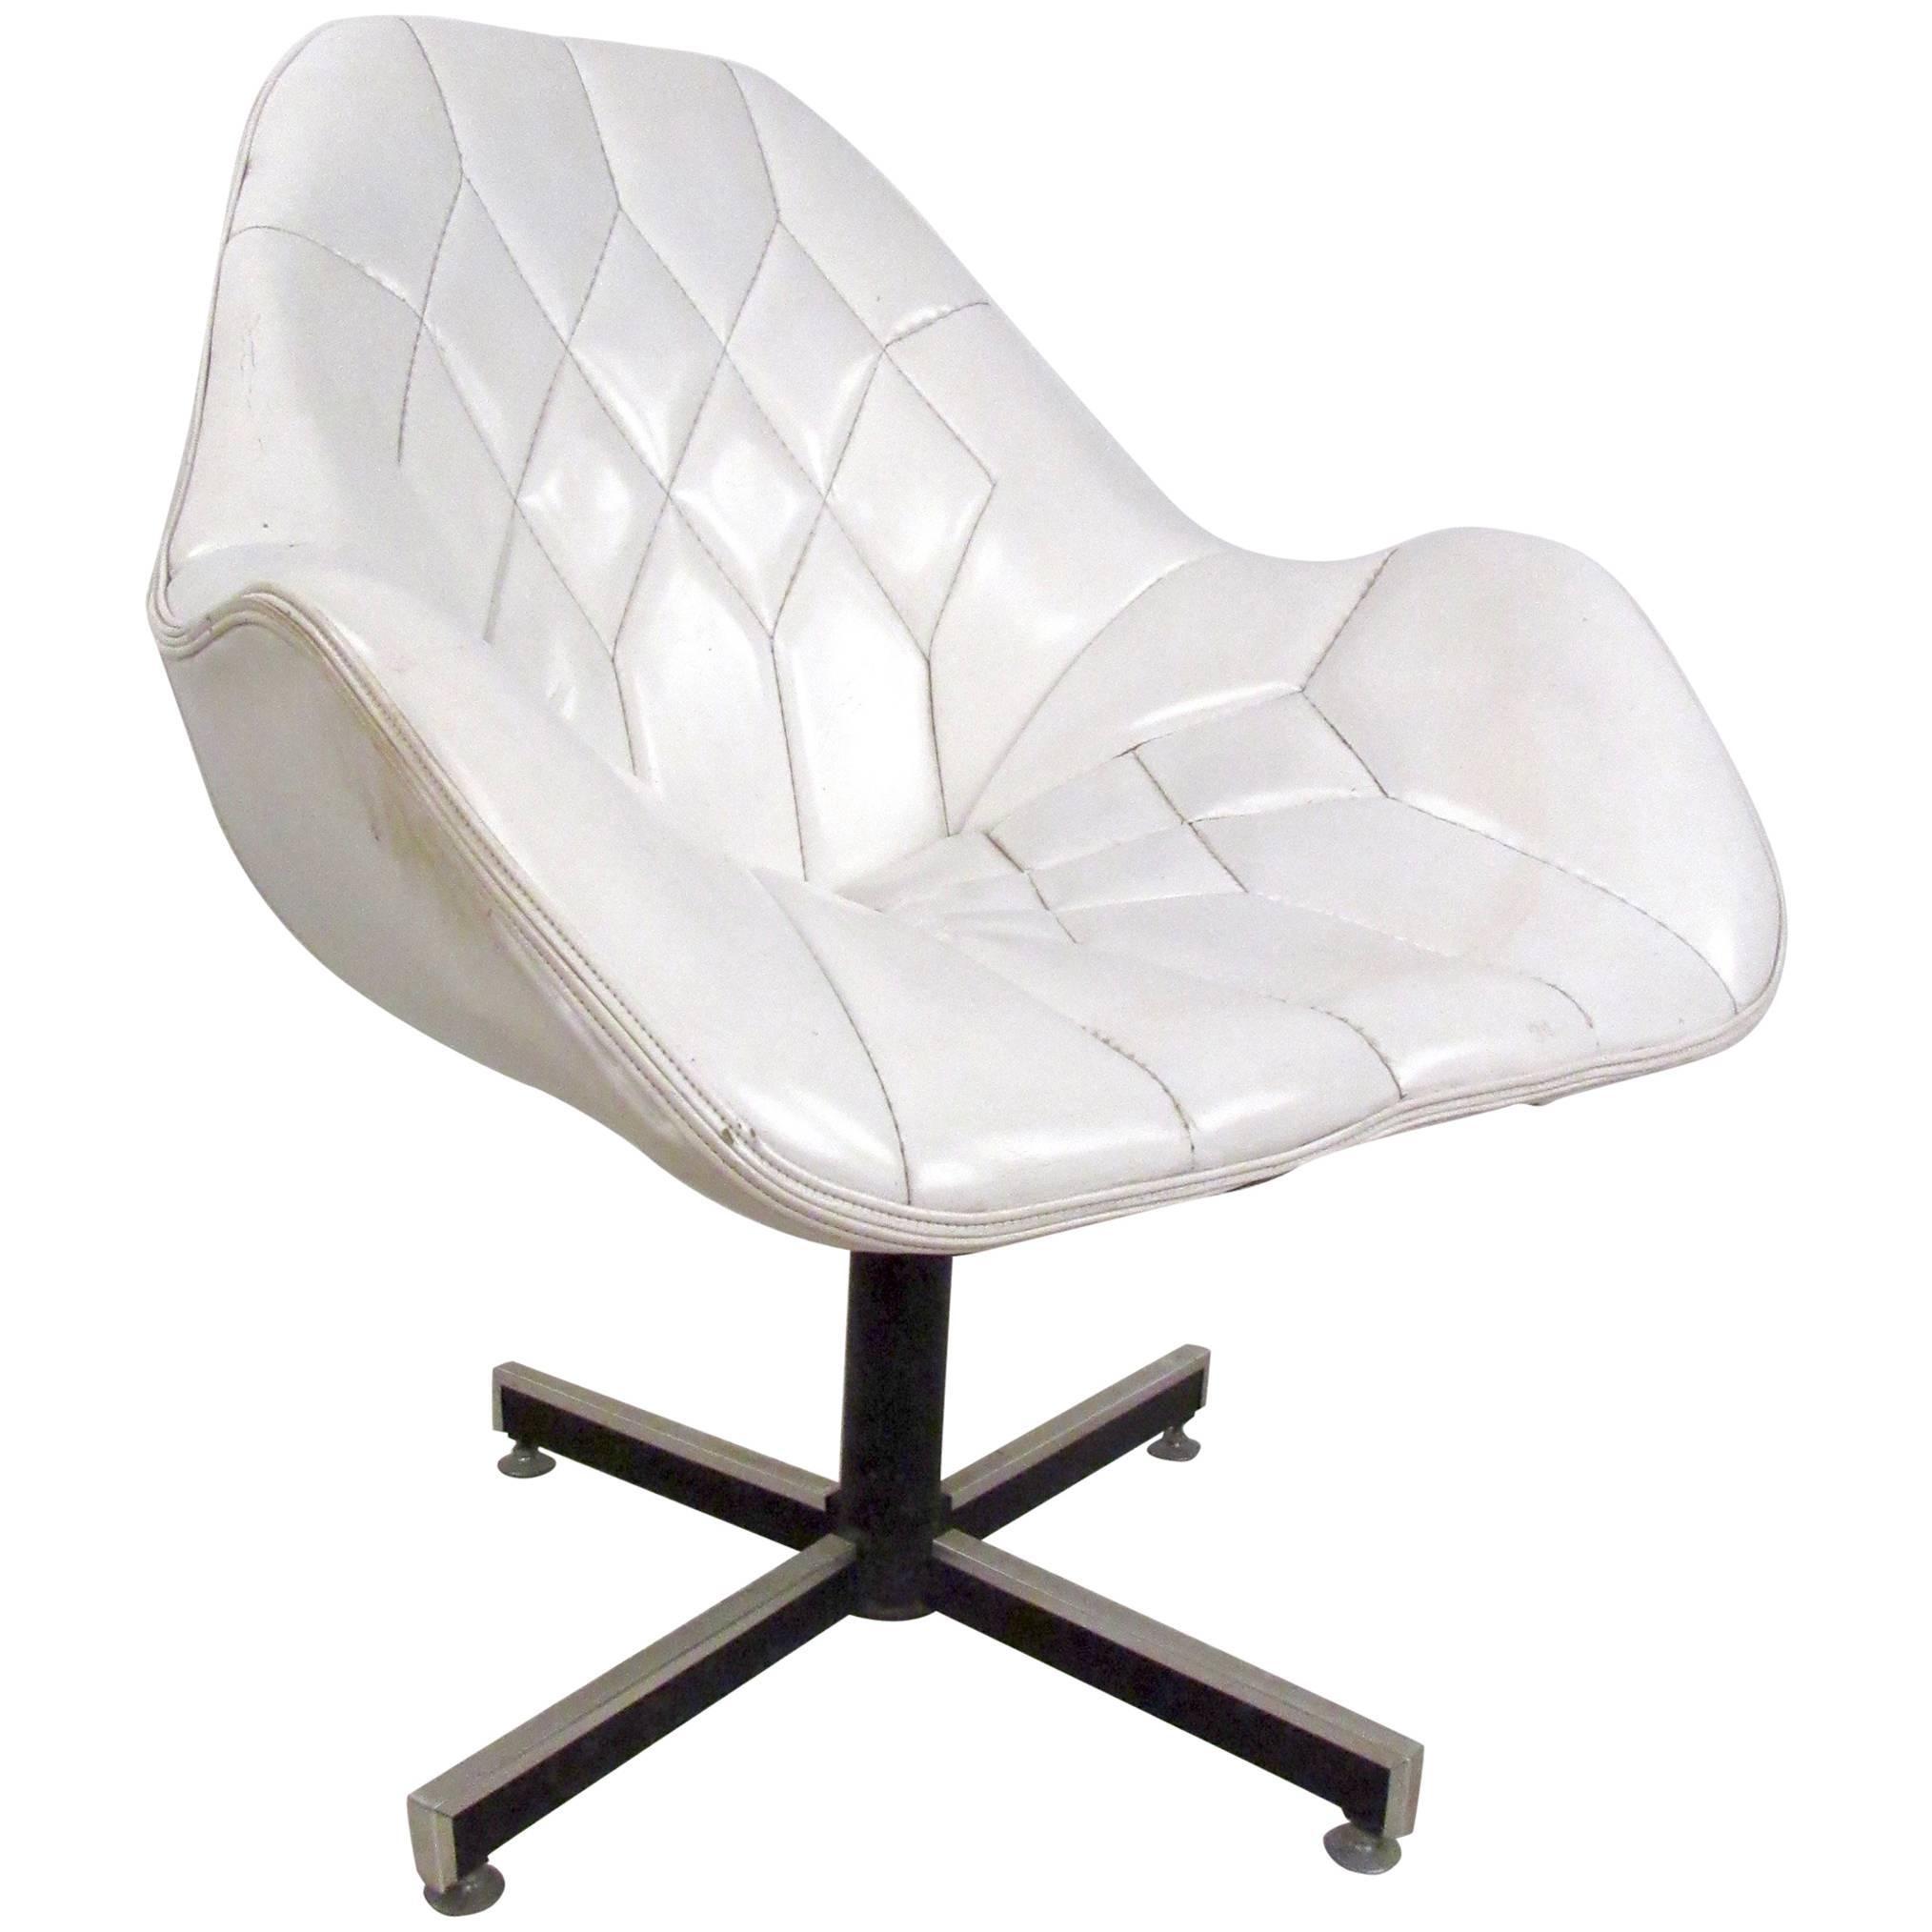 Mid-Century Modern Tufted Swivel Lounge Chair